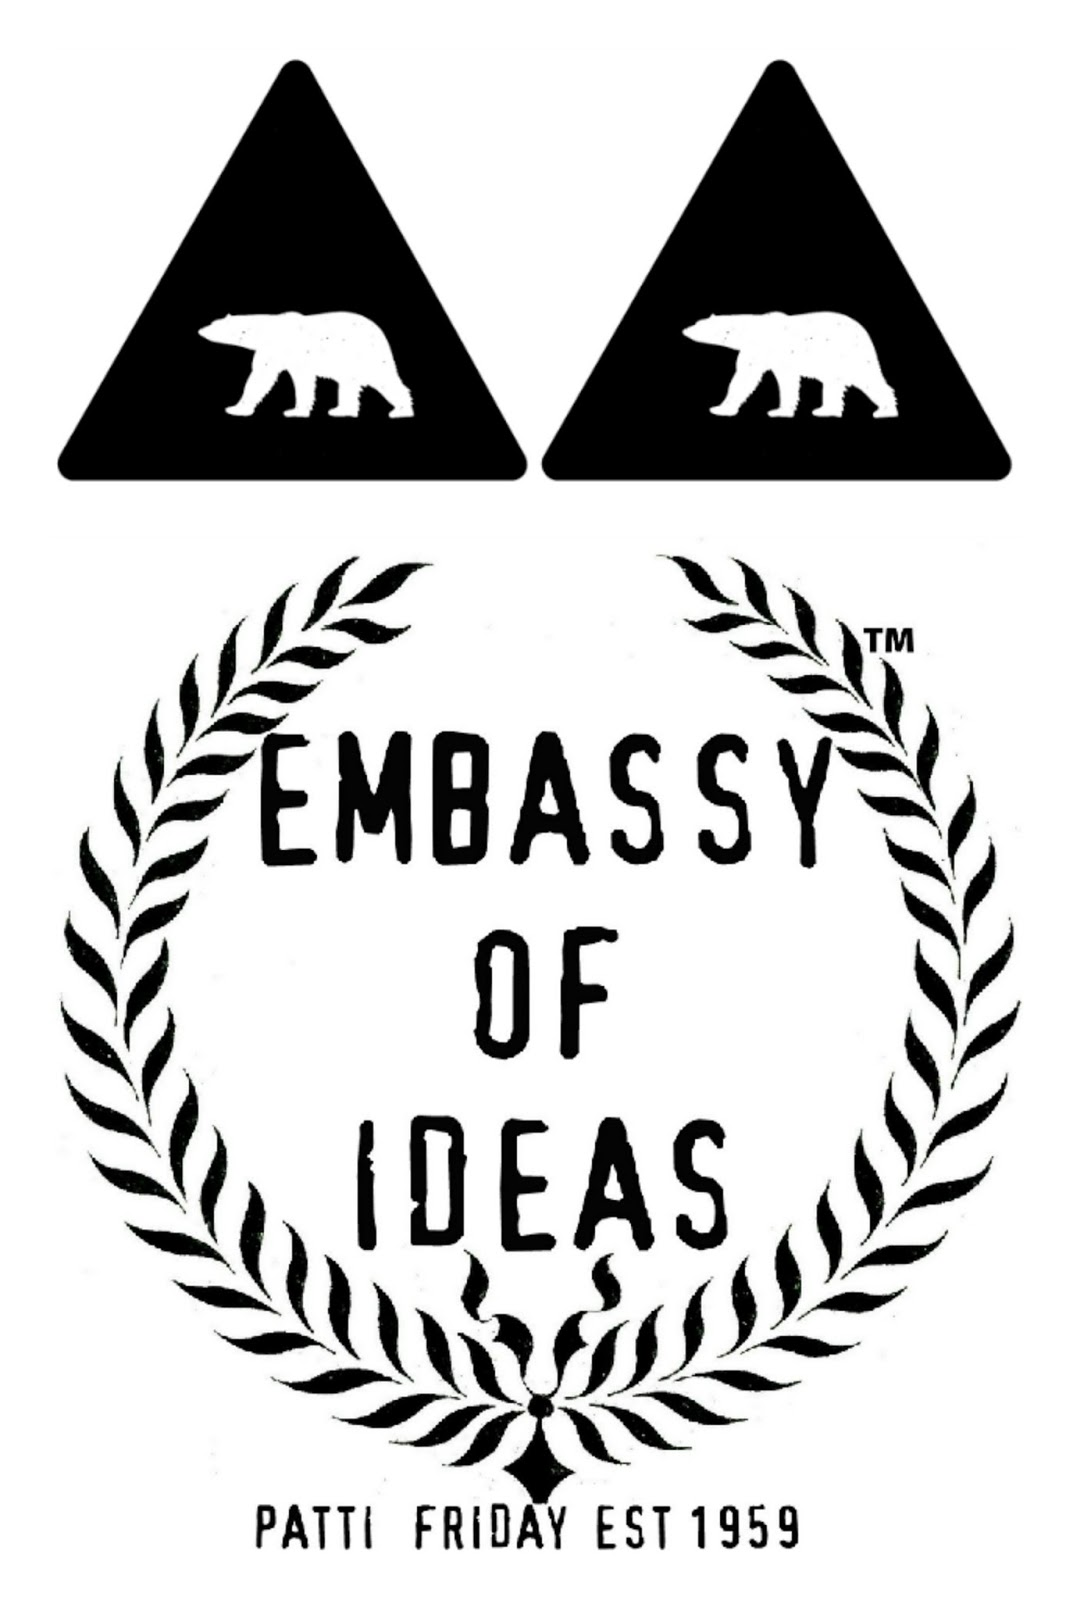 Shirt design inspiration - Evolution Of T Shirt Design Inspiration Bear Russia Gay Rights Sochi